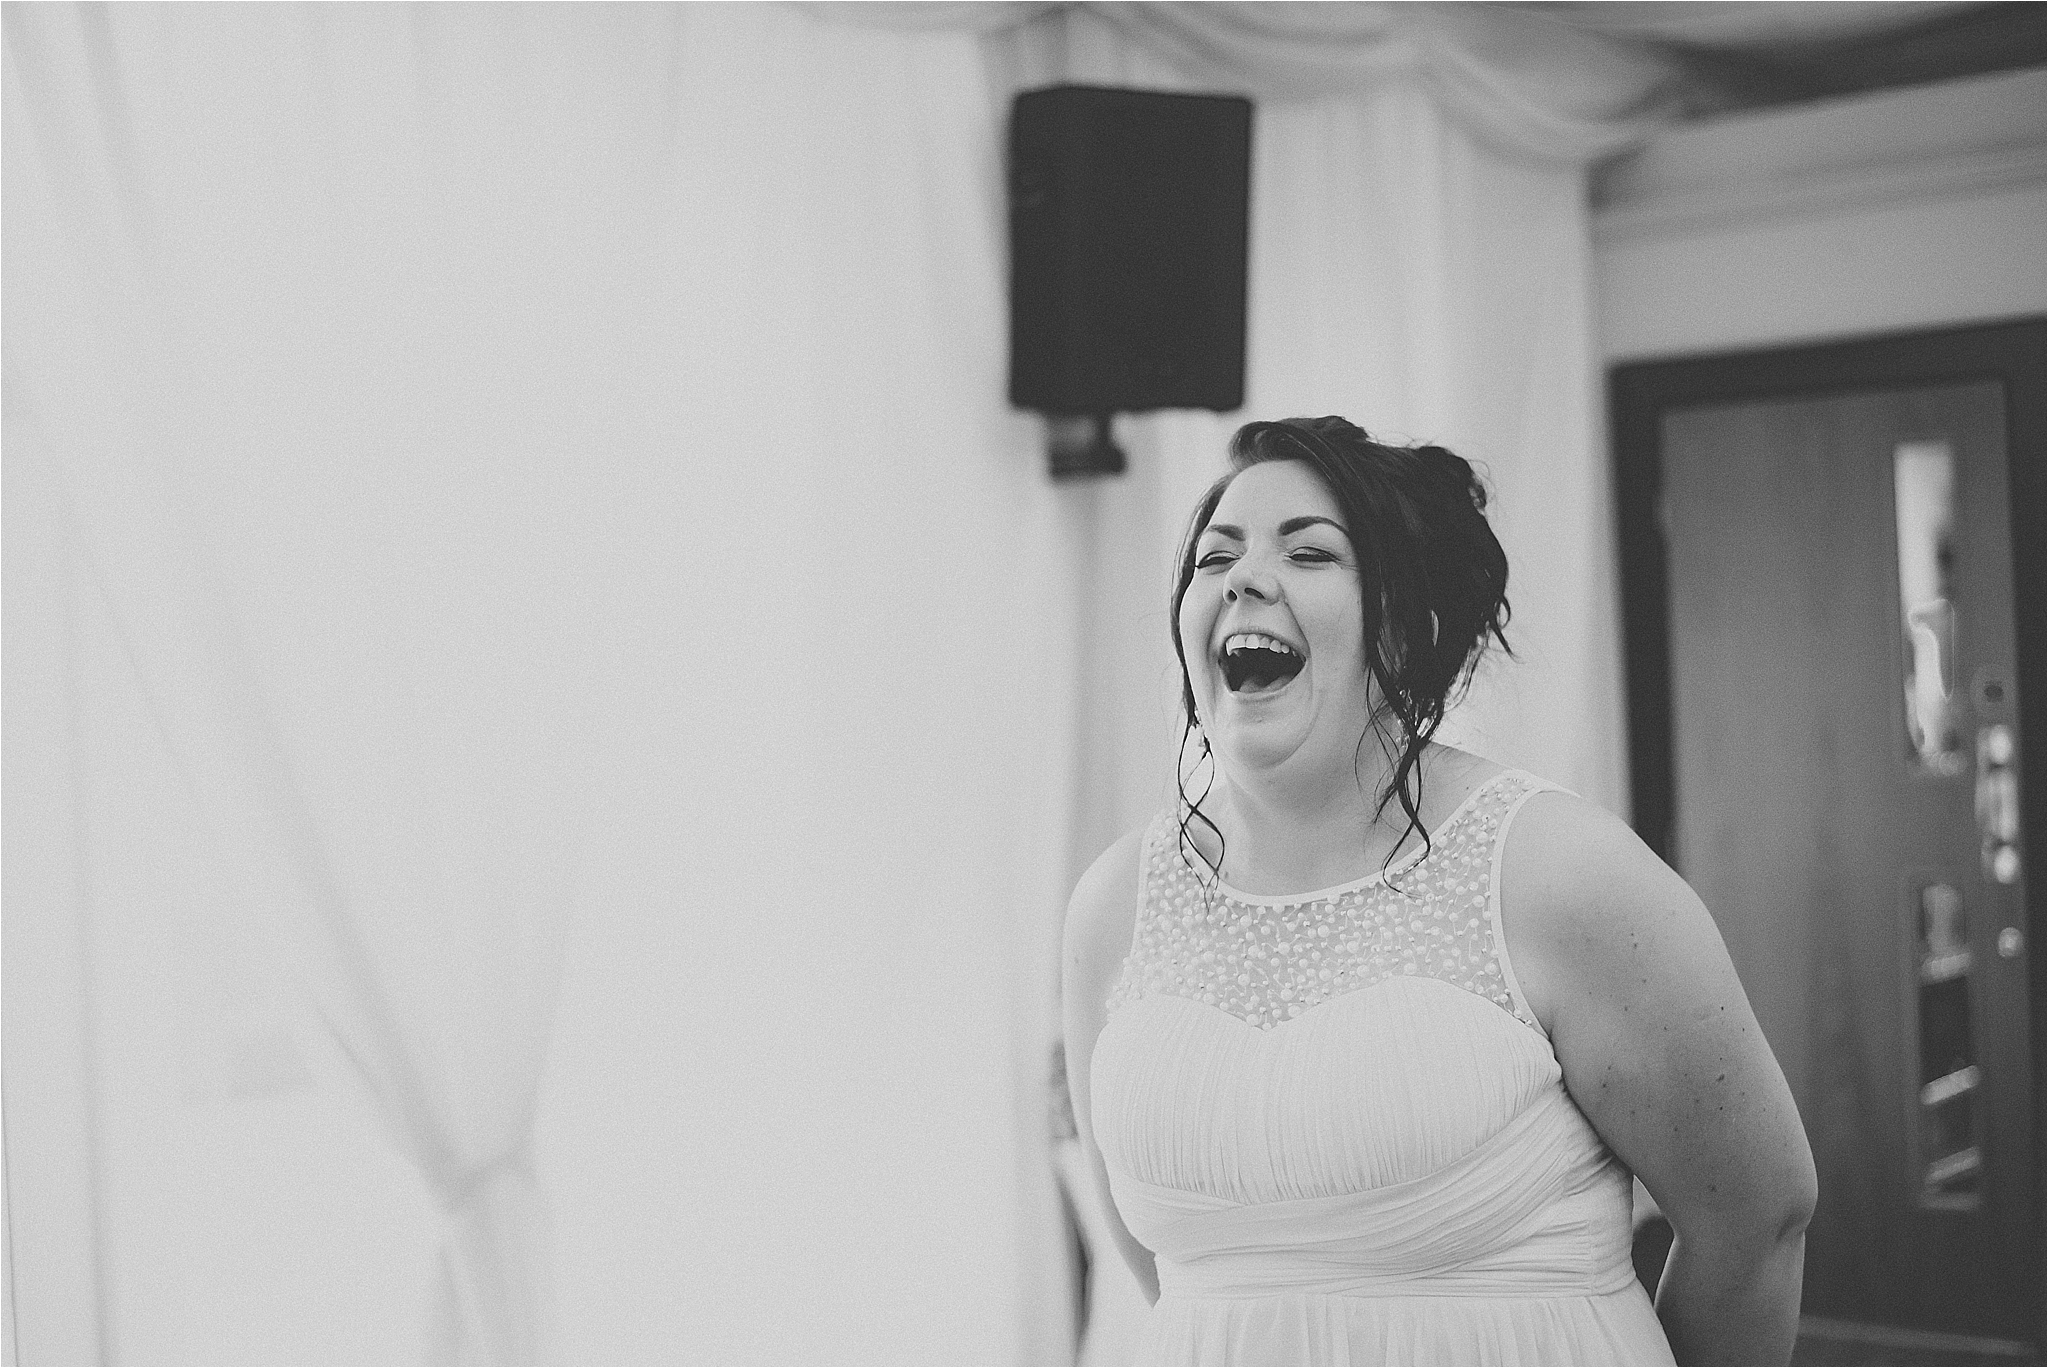 thevilla+lancashire+wreagreen+wedding+photographer49.jpg